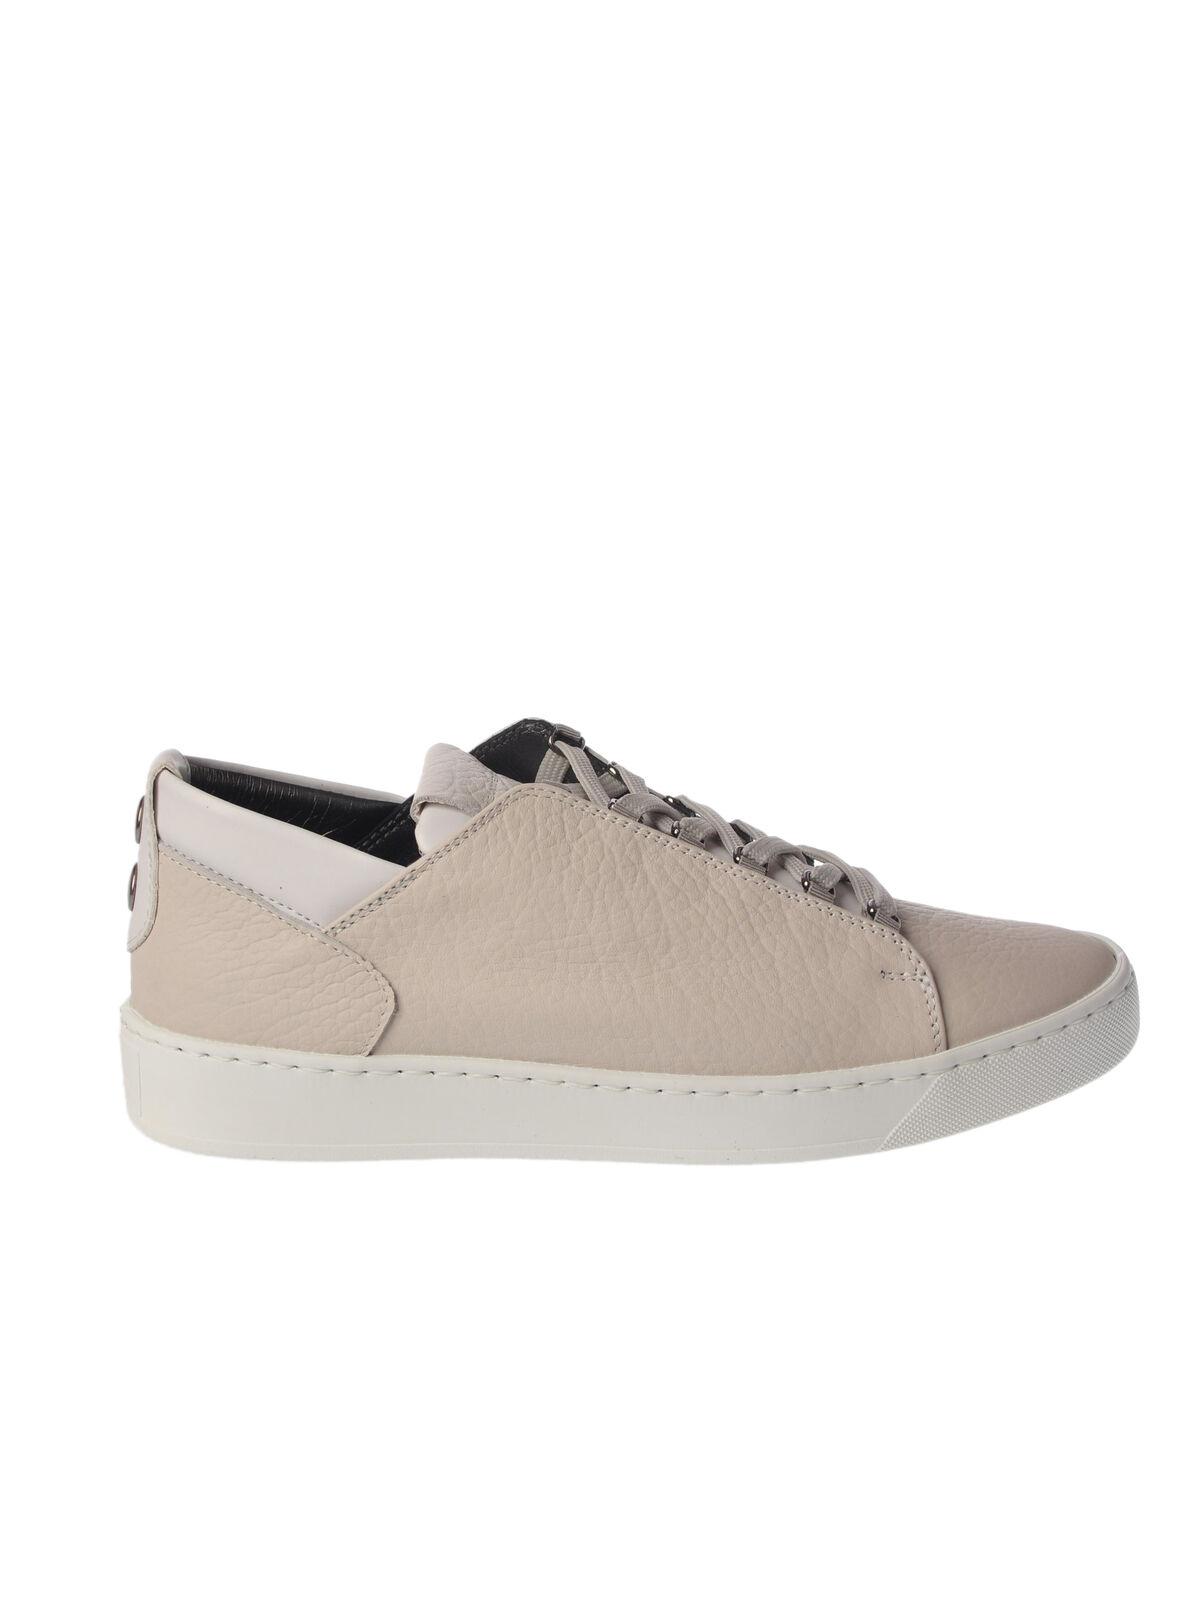 Alexander Smith - shoes-Sneakers low - Man - Beige - 4992813F181126